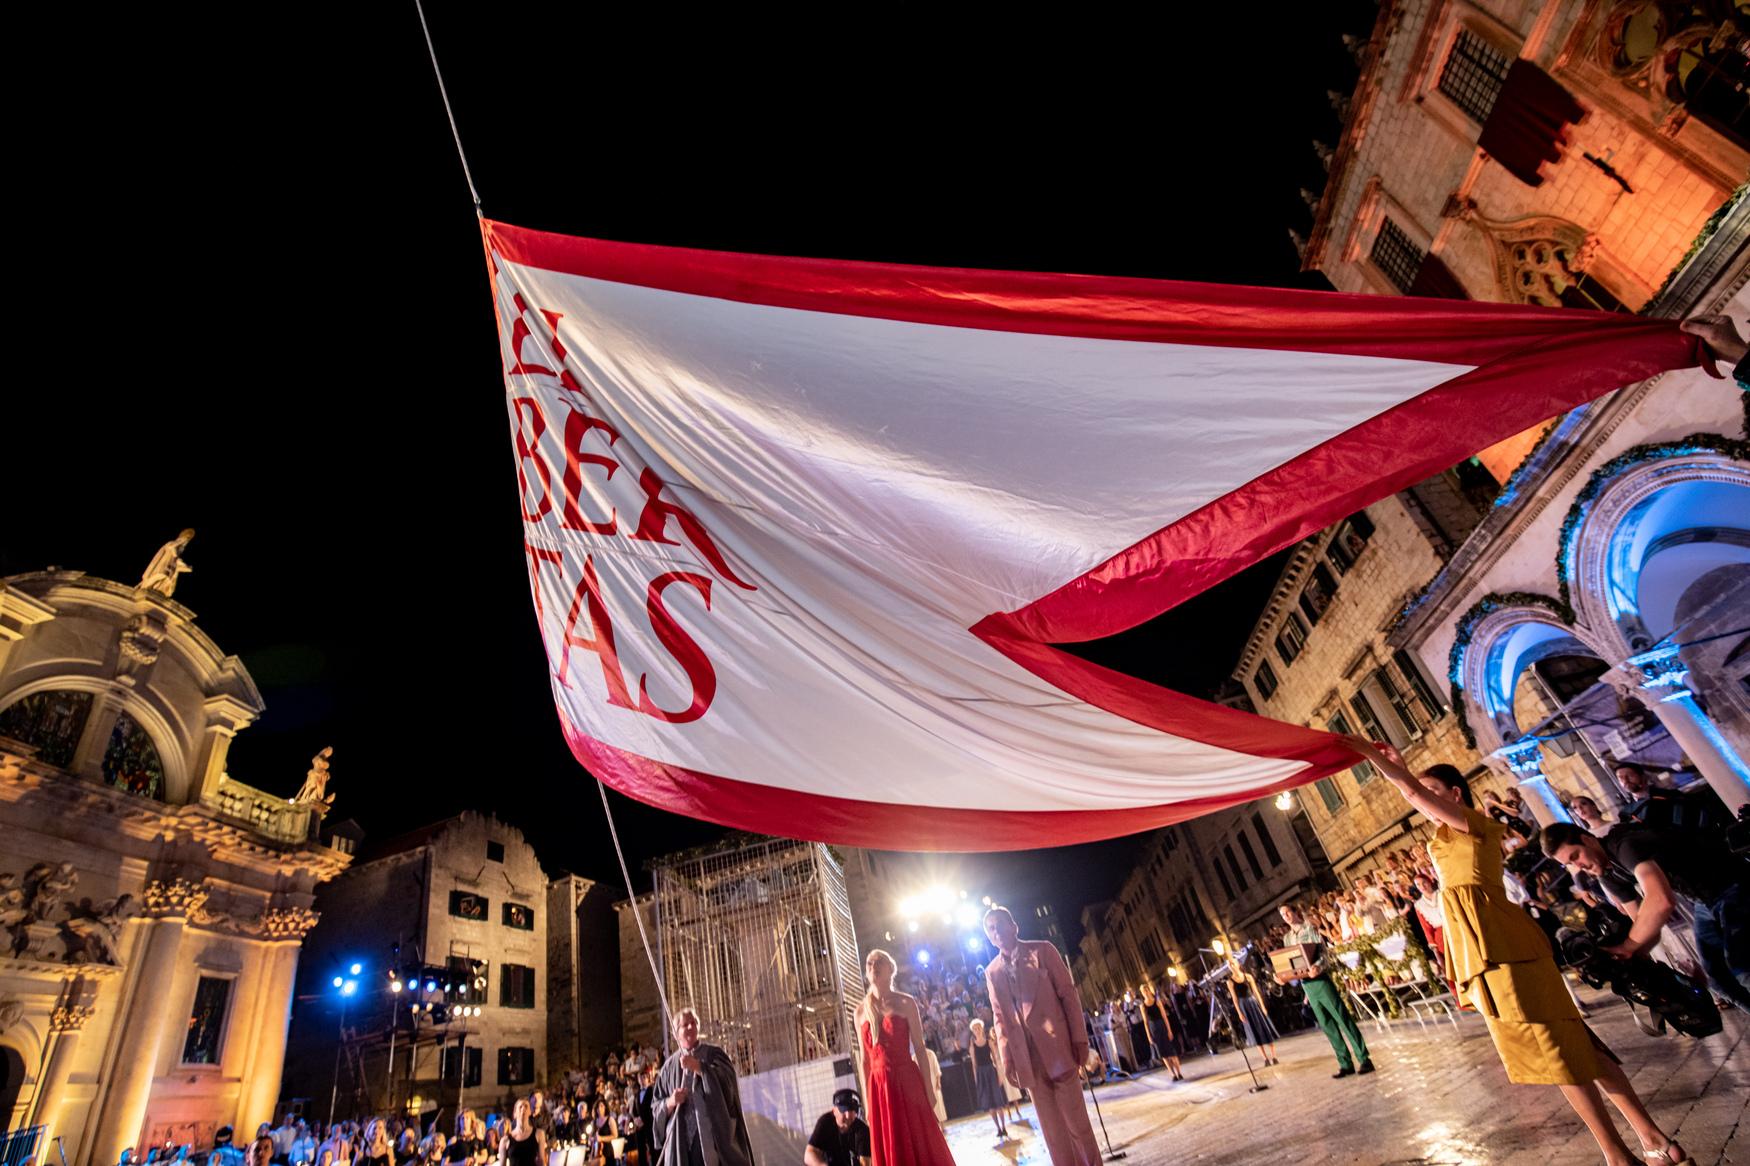 72nd Dubrovnik Summer Festival opens